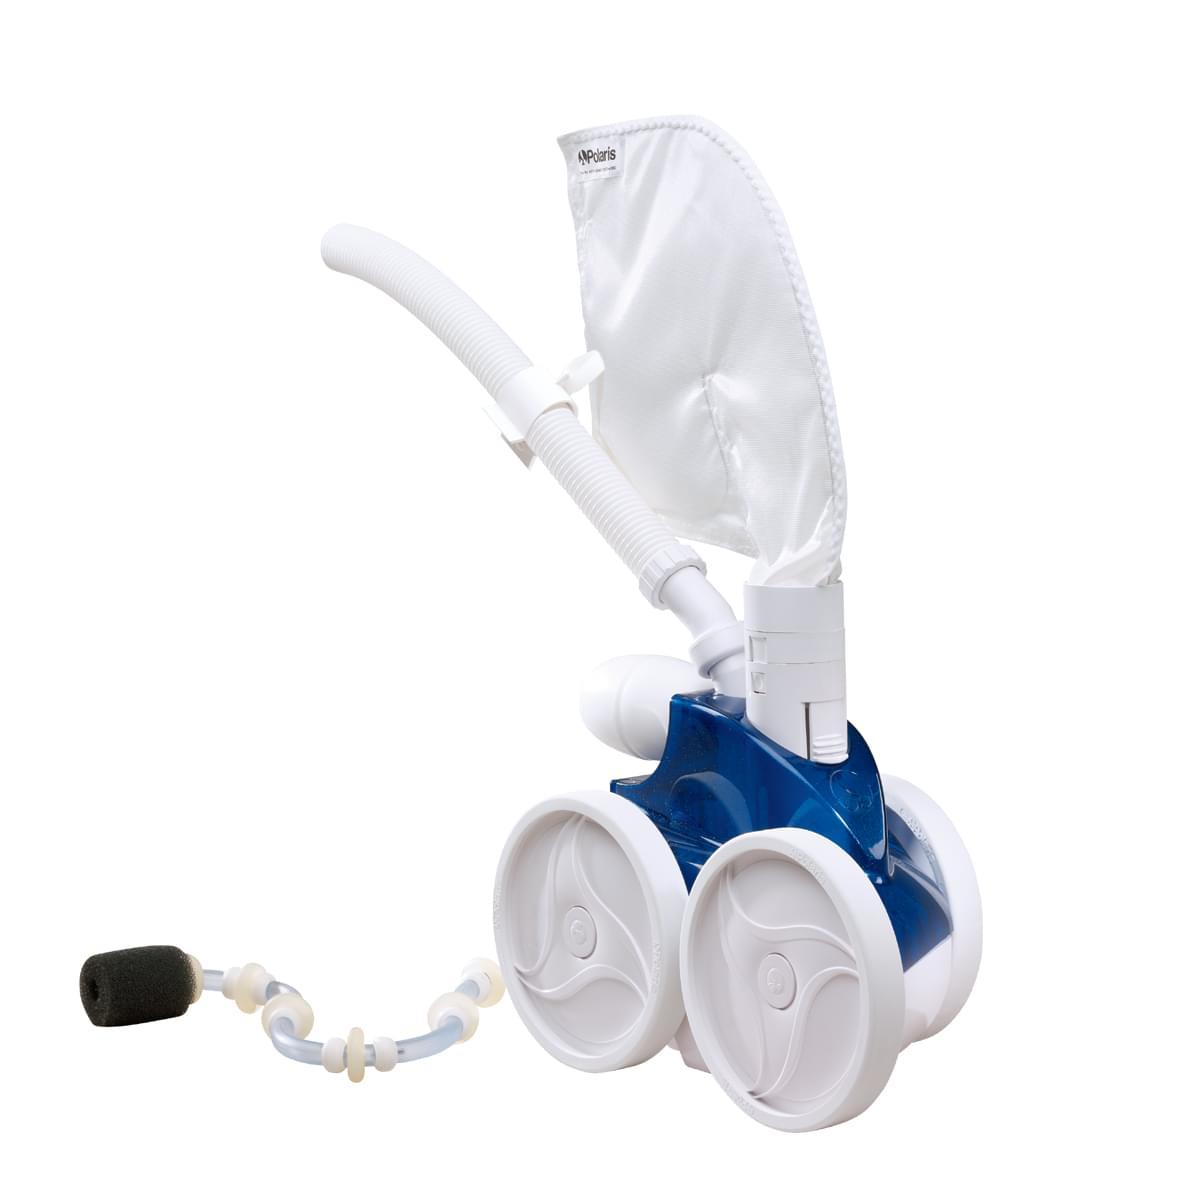 Nettoyeur automatique pression lat ral 360 de polaris for Nettoyeur piscine polaris